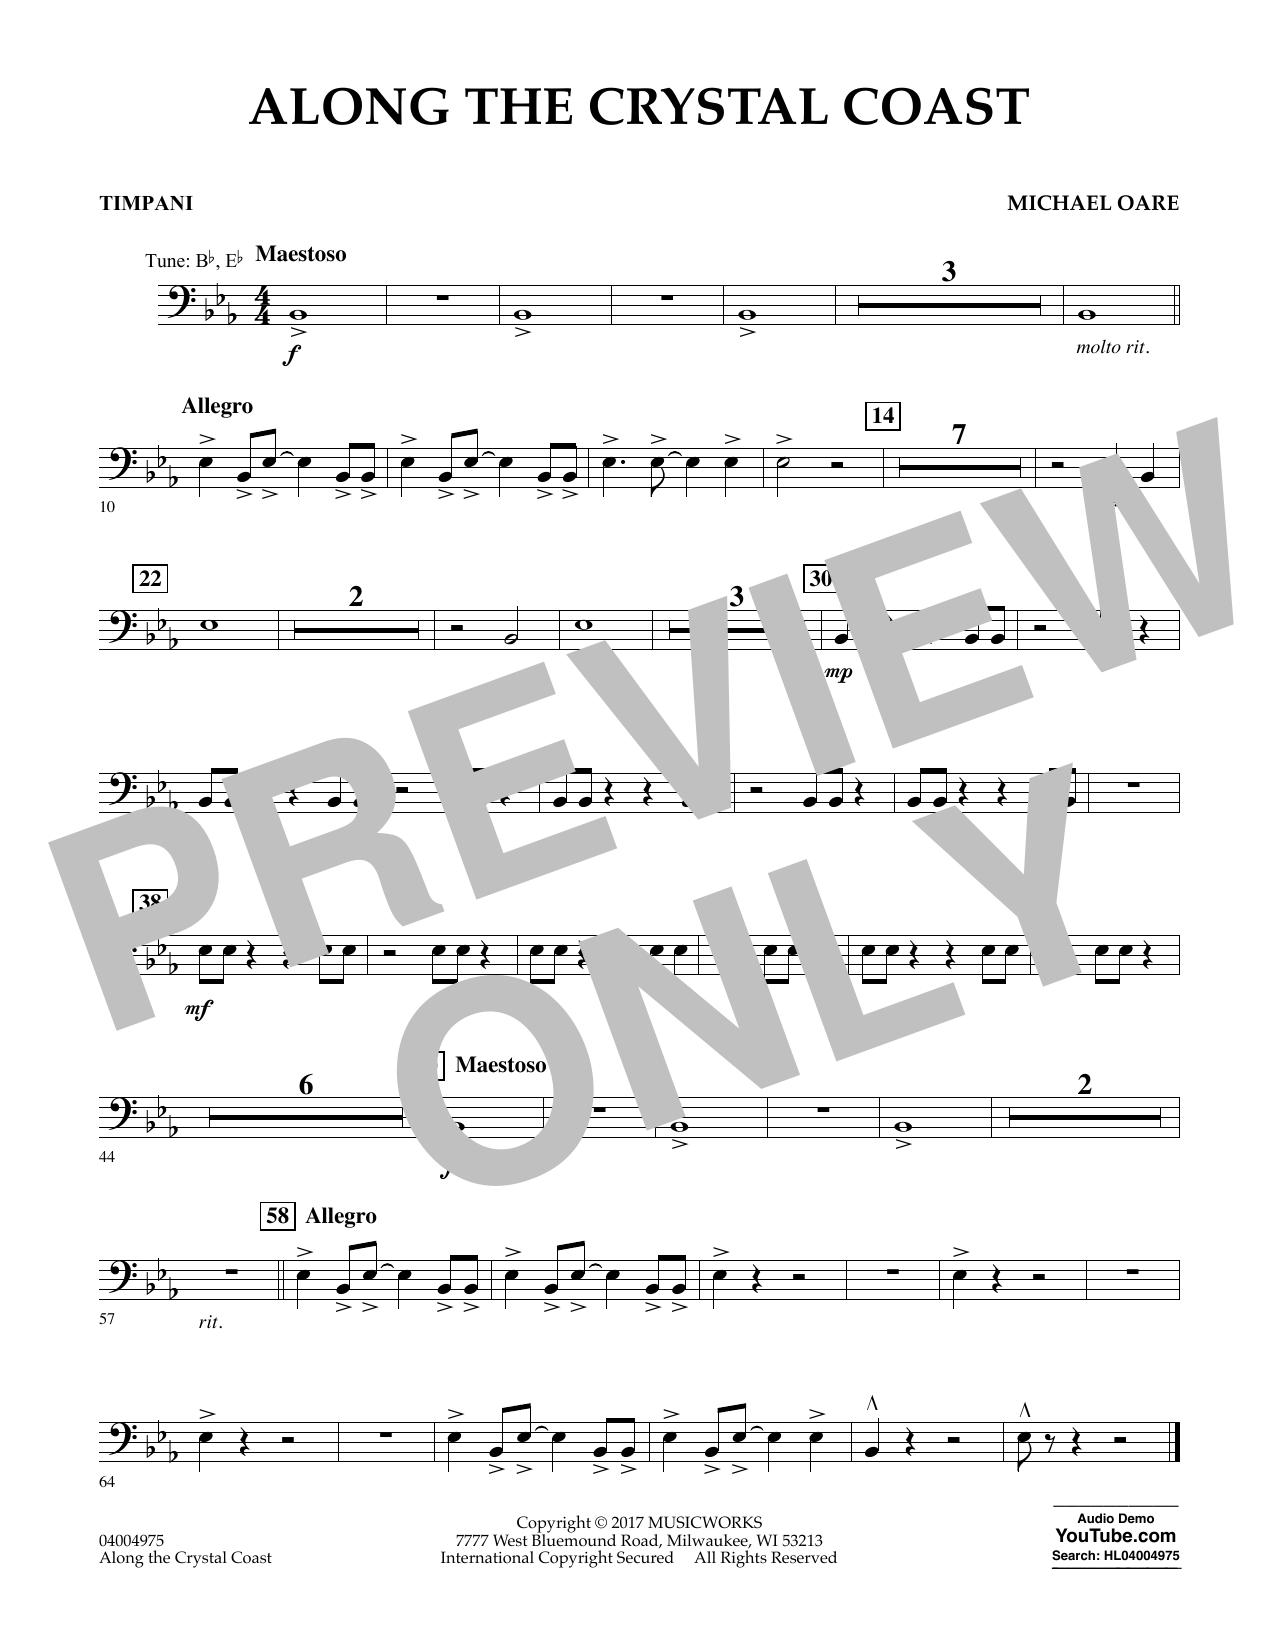 Along the Crystal Coast - Timpani Sheet Music